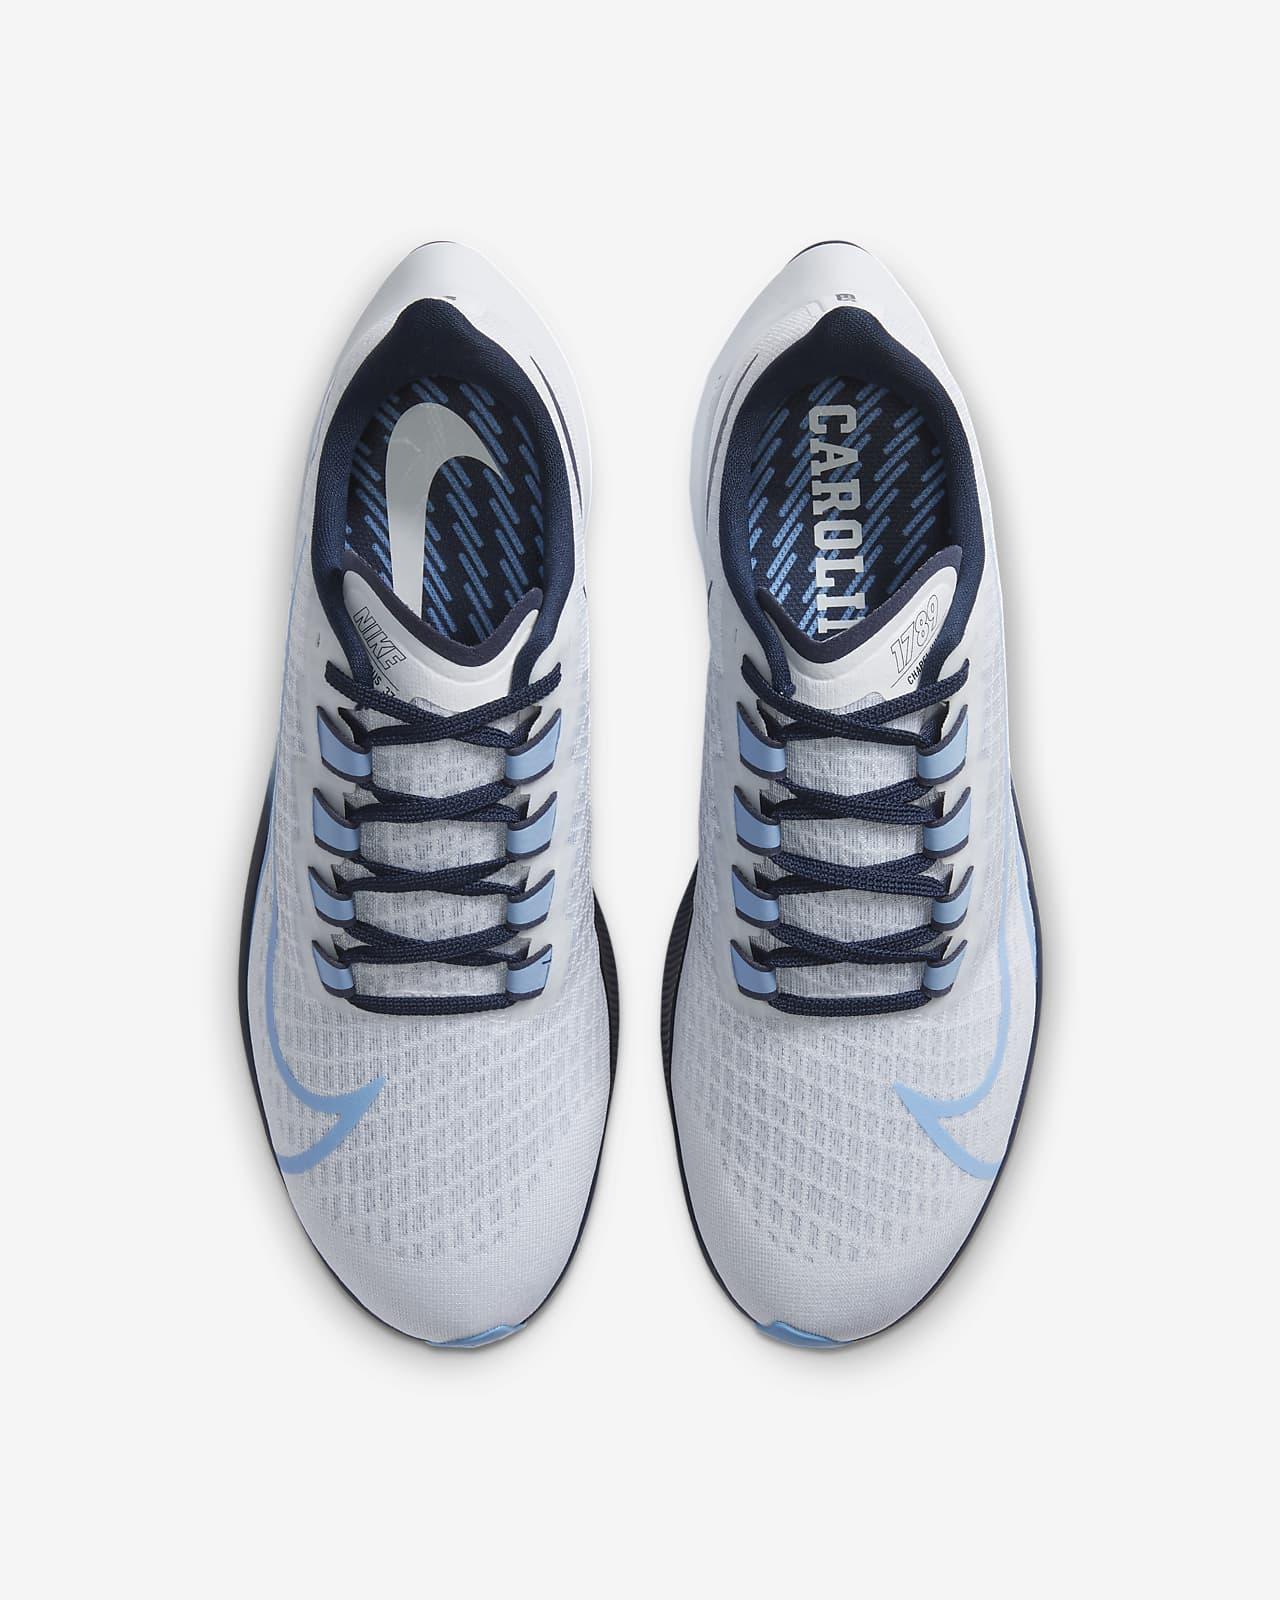 Calzado de running Nike College Zoom